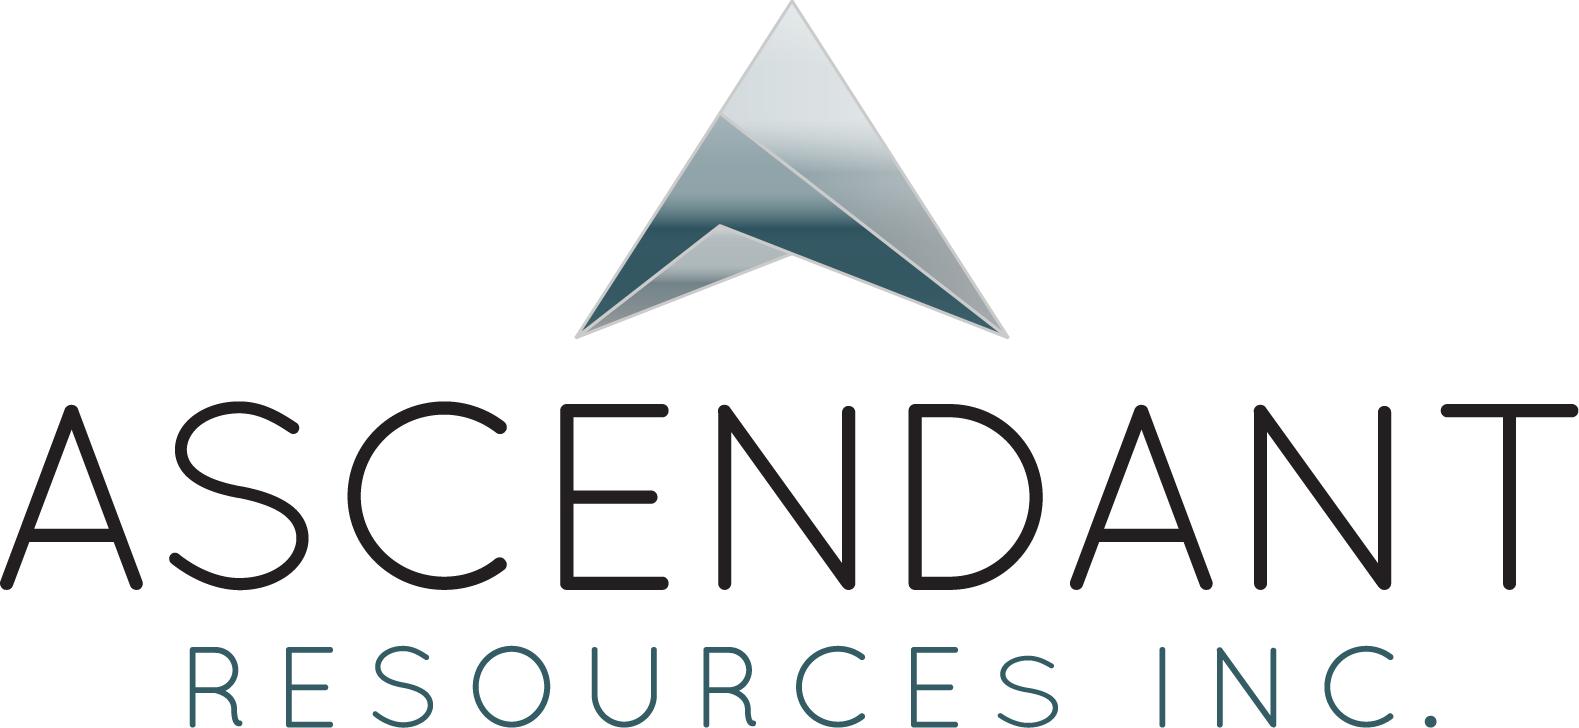 Ascendant Resources to Sell El Mochito Mine